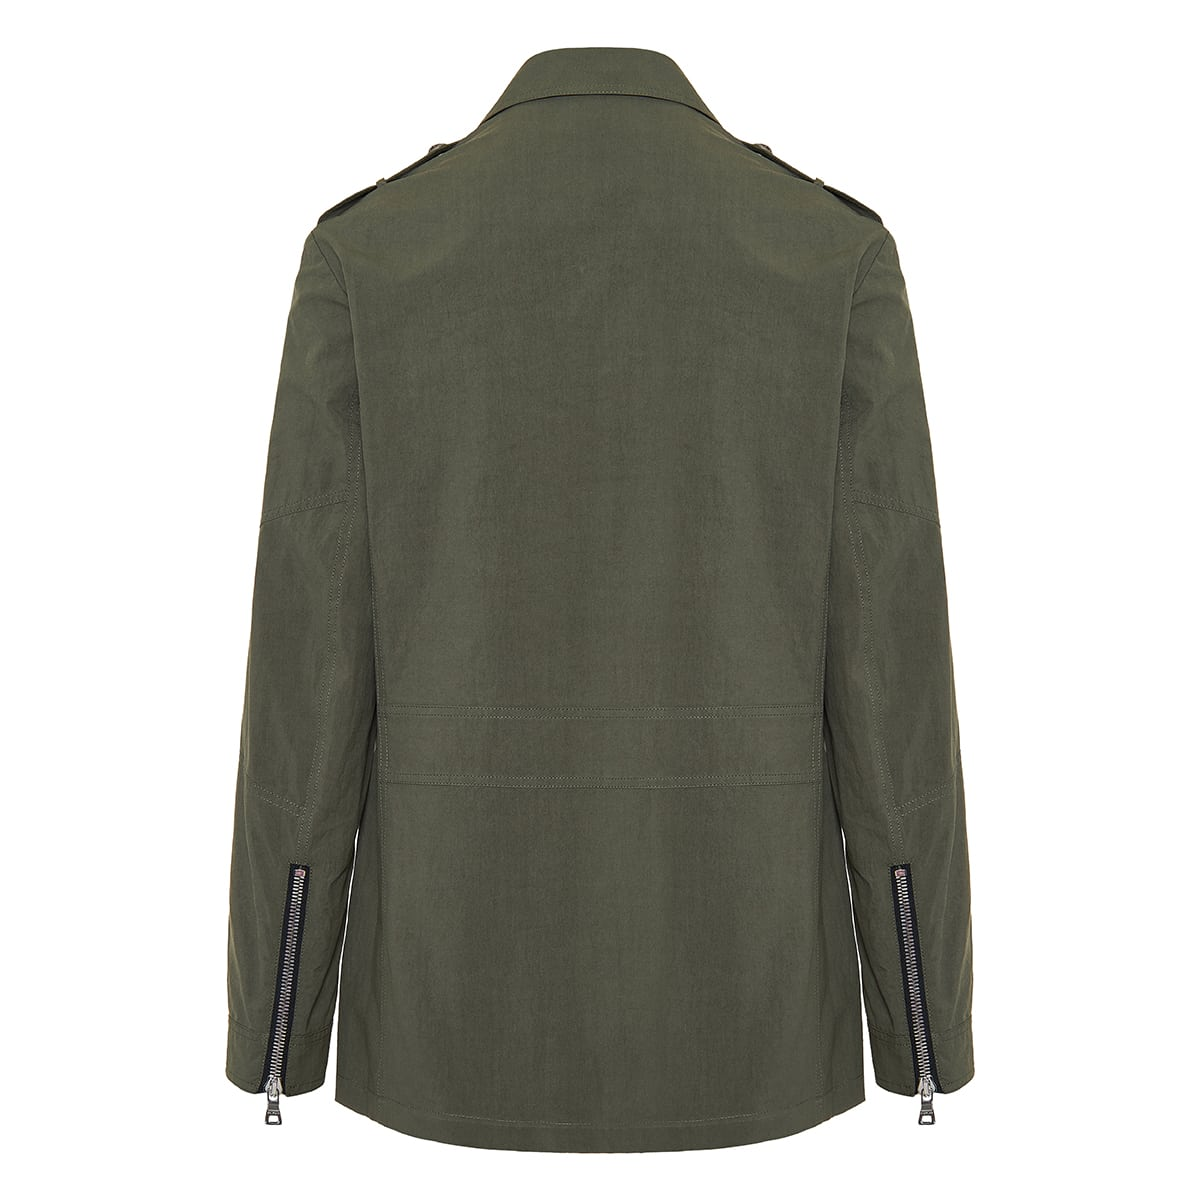 Multi-pocket cotton jacket